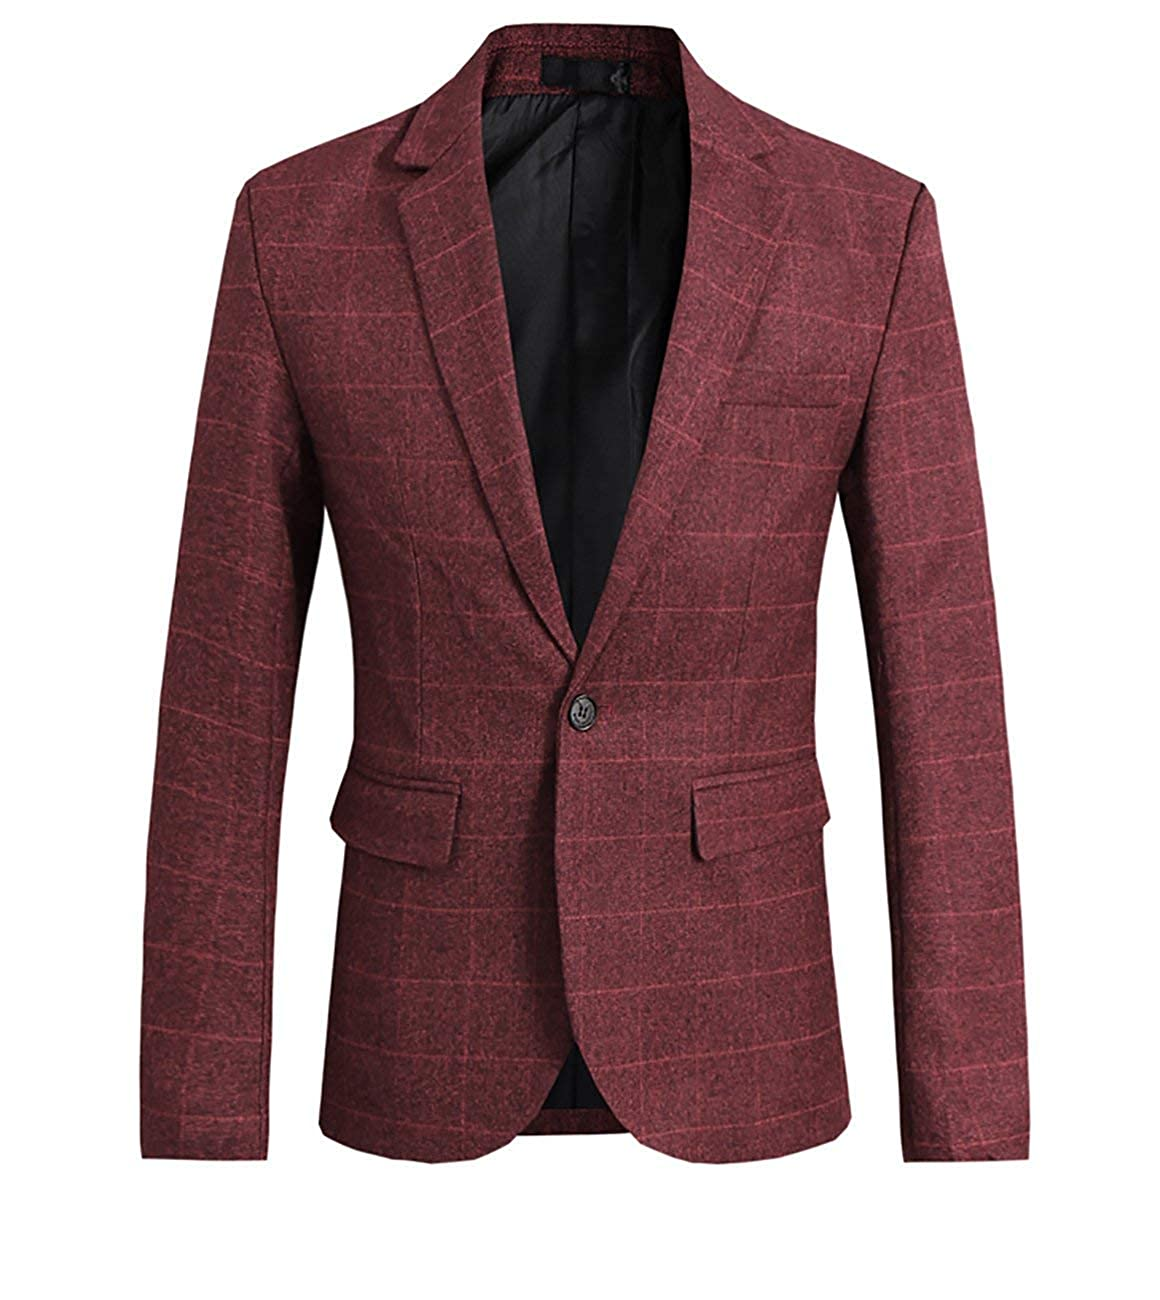 f2191306b8b Adelina Men's Suit Jacket Checked Slim Fit Blazer Blazer 1 Smoking Retro  Wedding Button Party Tuxedo Cocktail Elegant Suit Jacket Long Sleeve Party:  ...